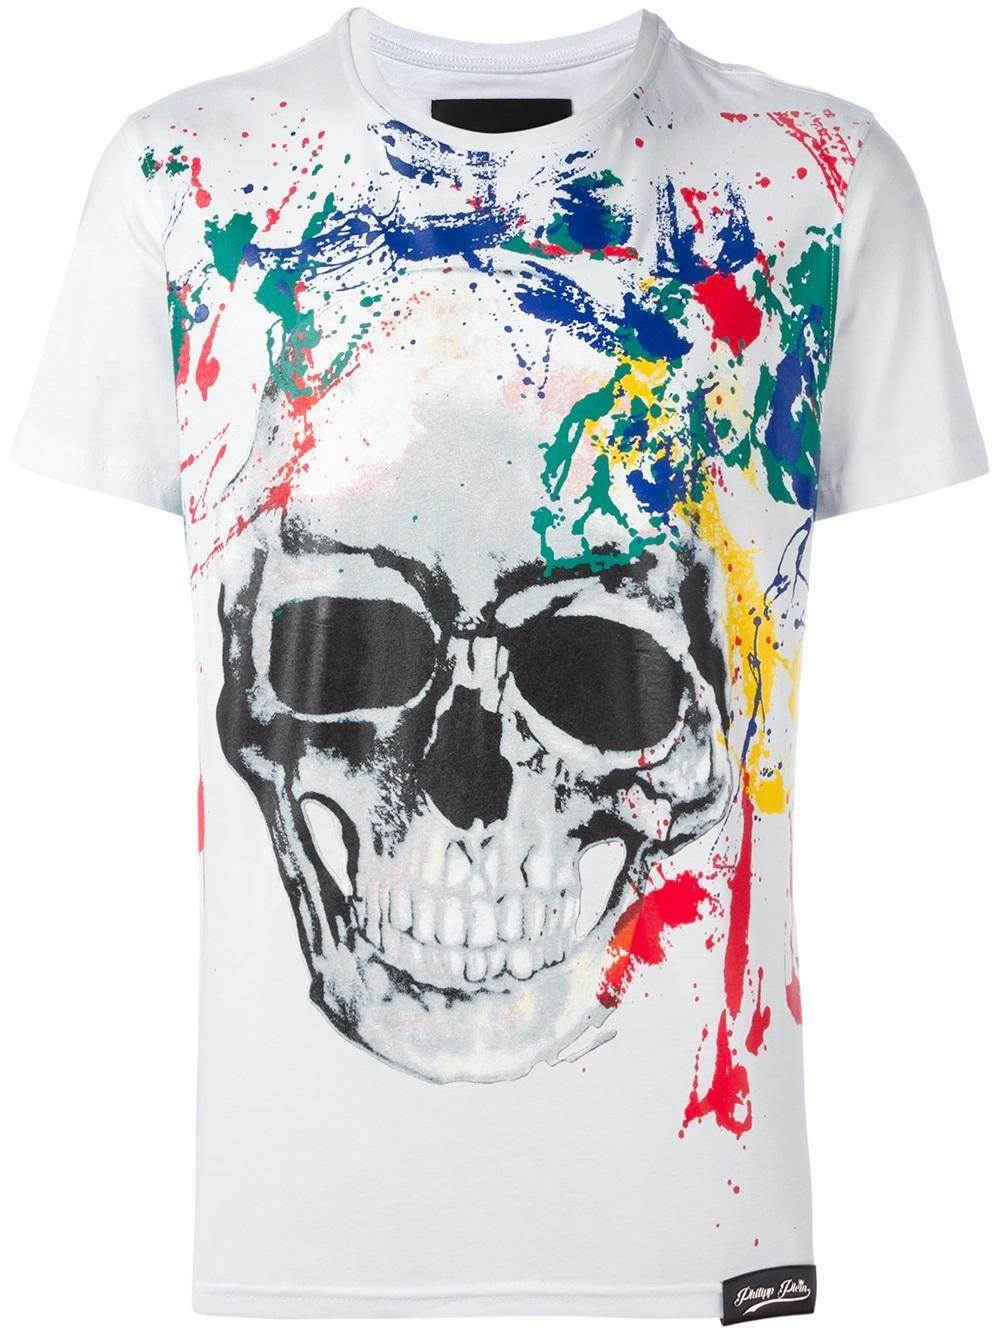 a56544a2 Philipp Plein painted skull print T-shirt Camisetas De Calavera, Camisetas  Estampadas, Chaquetas